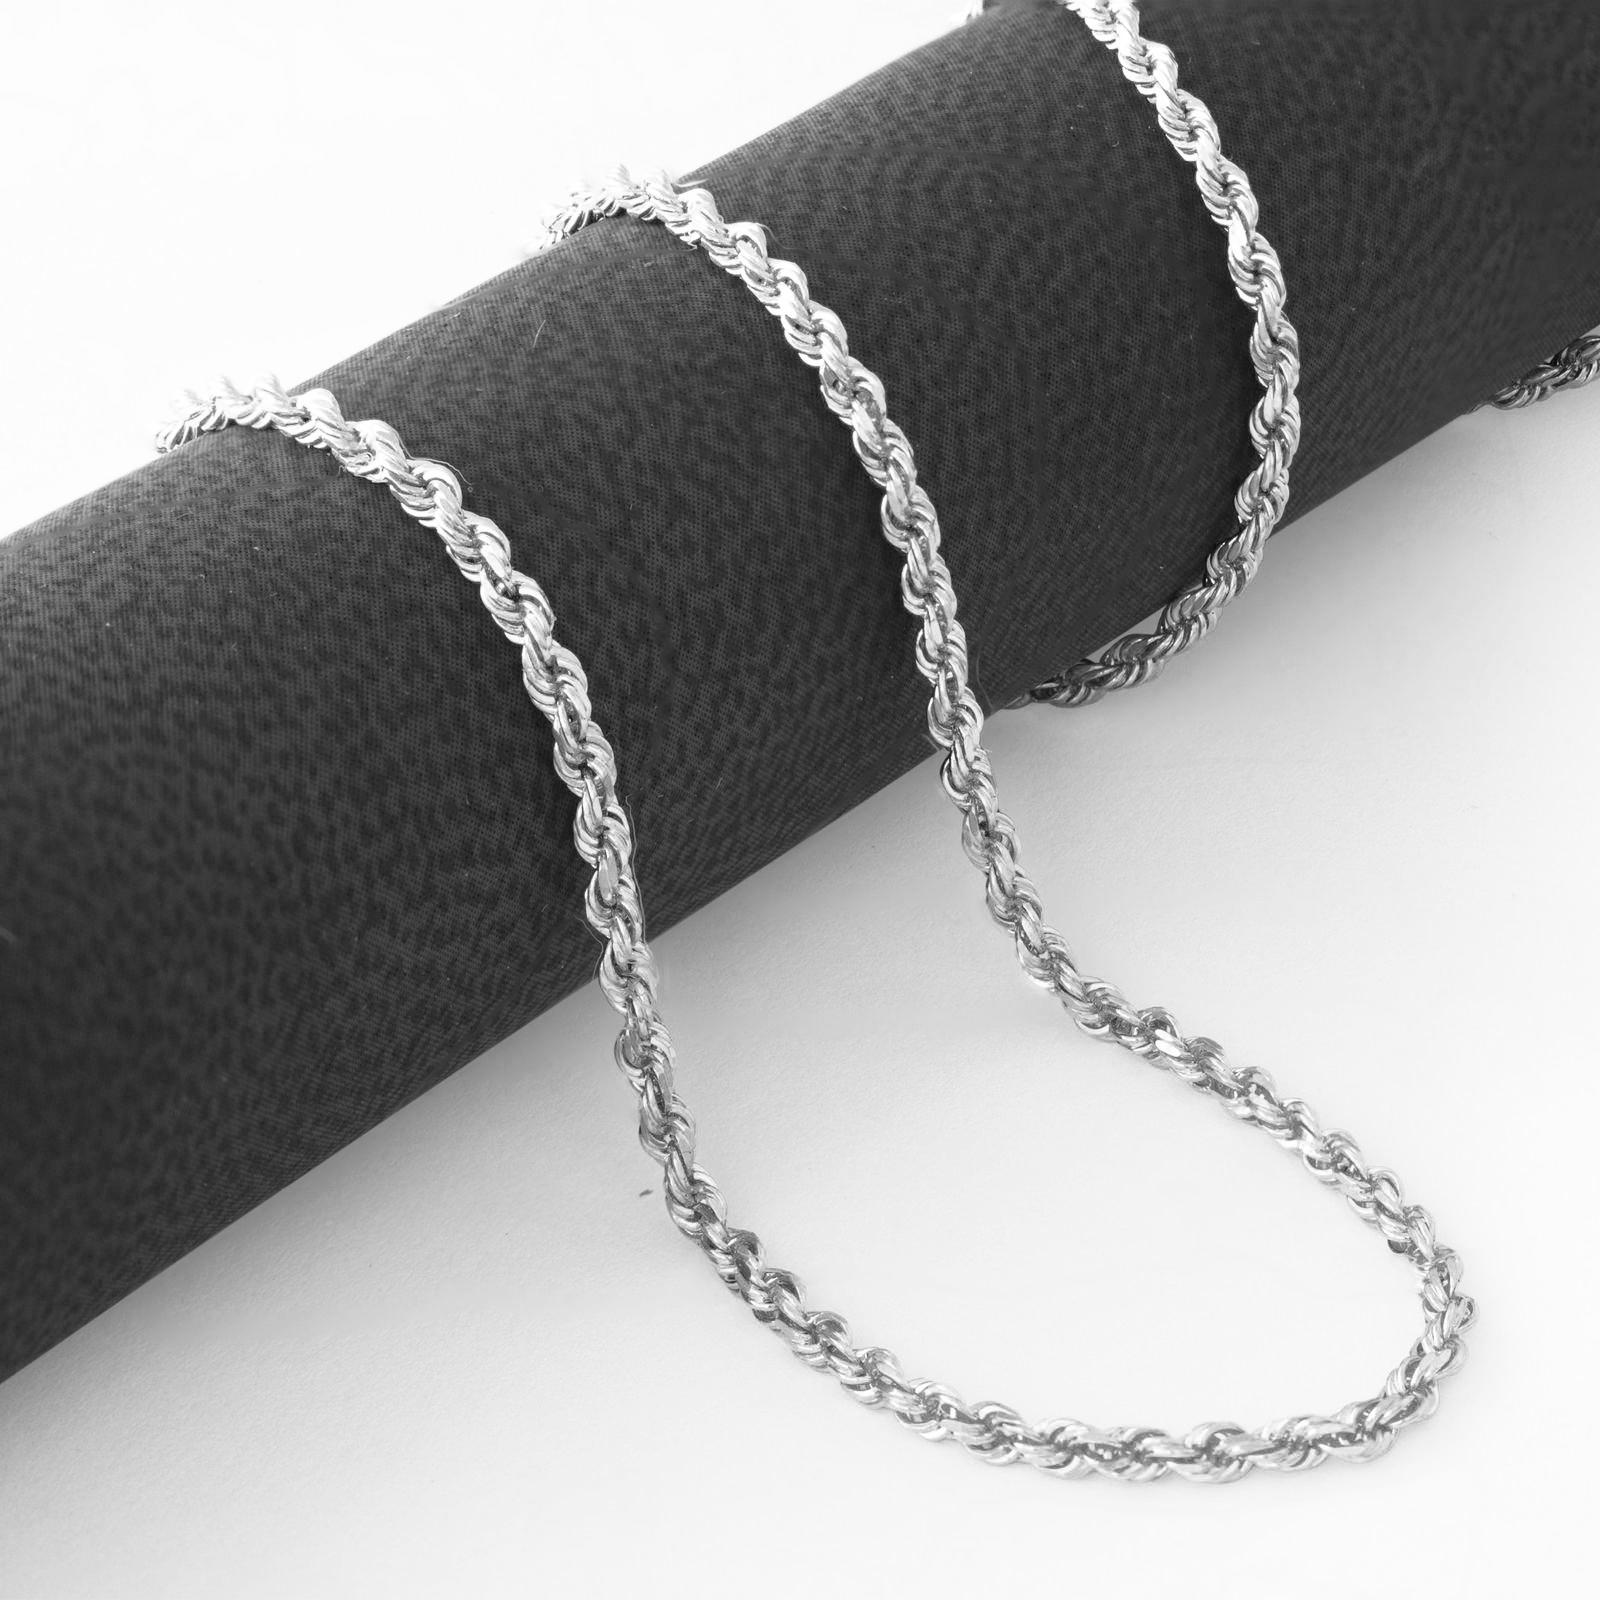 14K-White-Gold-Womens-1-5mm-Thin-Diamond-Cut-Rope-Chain-Pendant-Necklace-14-034-26-034 thumbnail 15